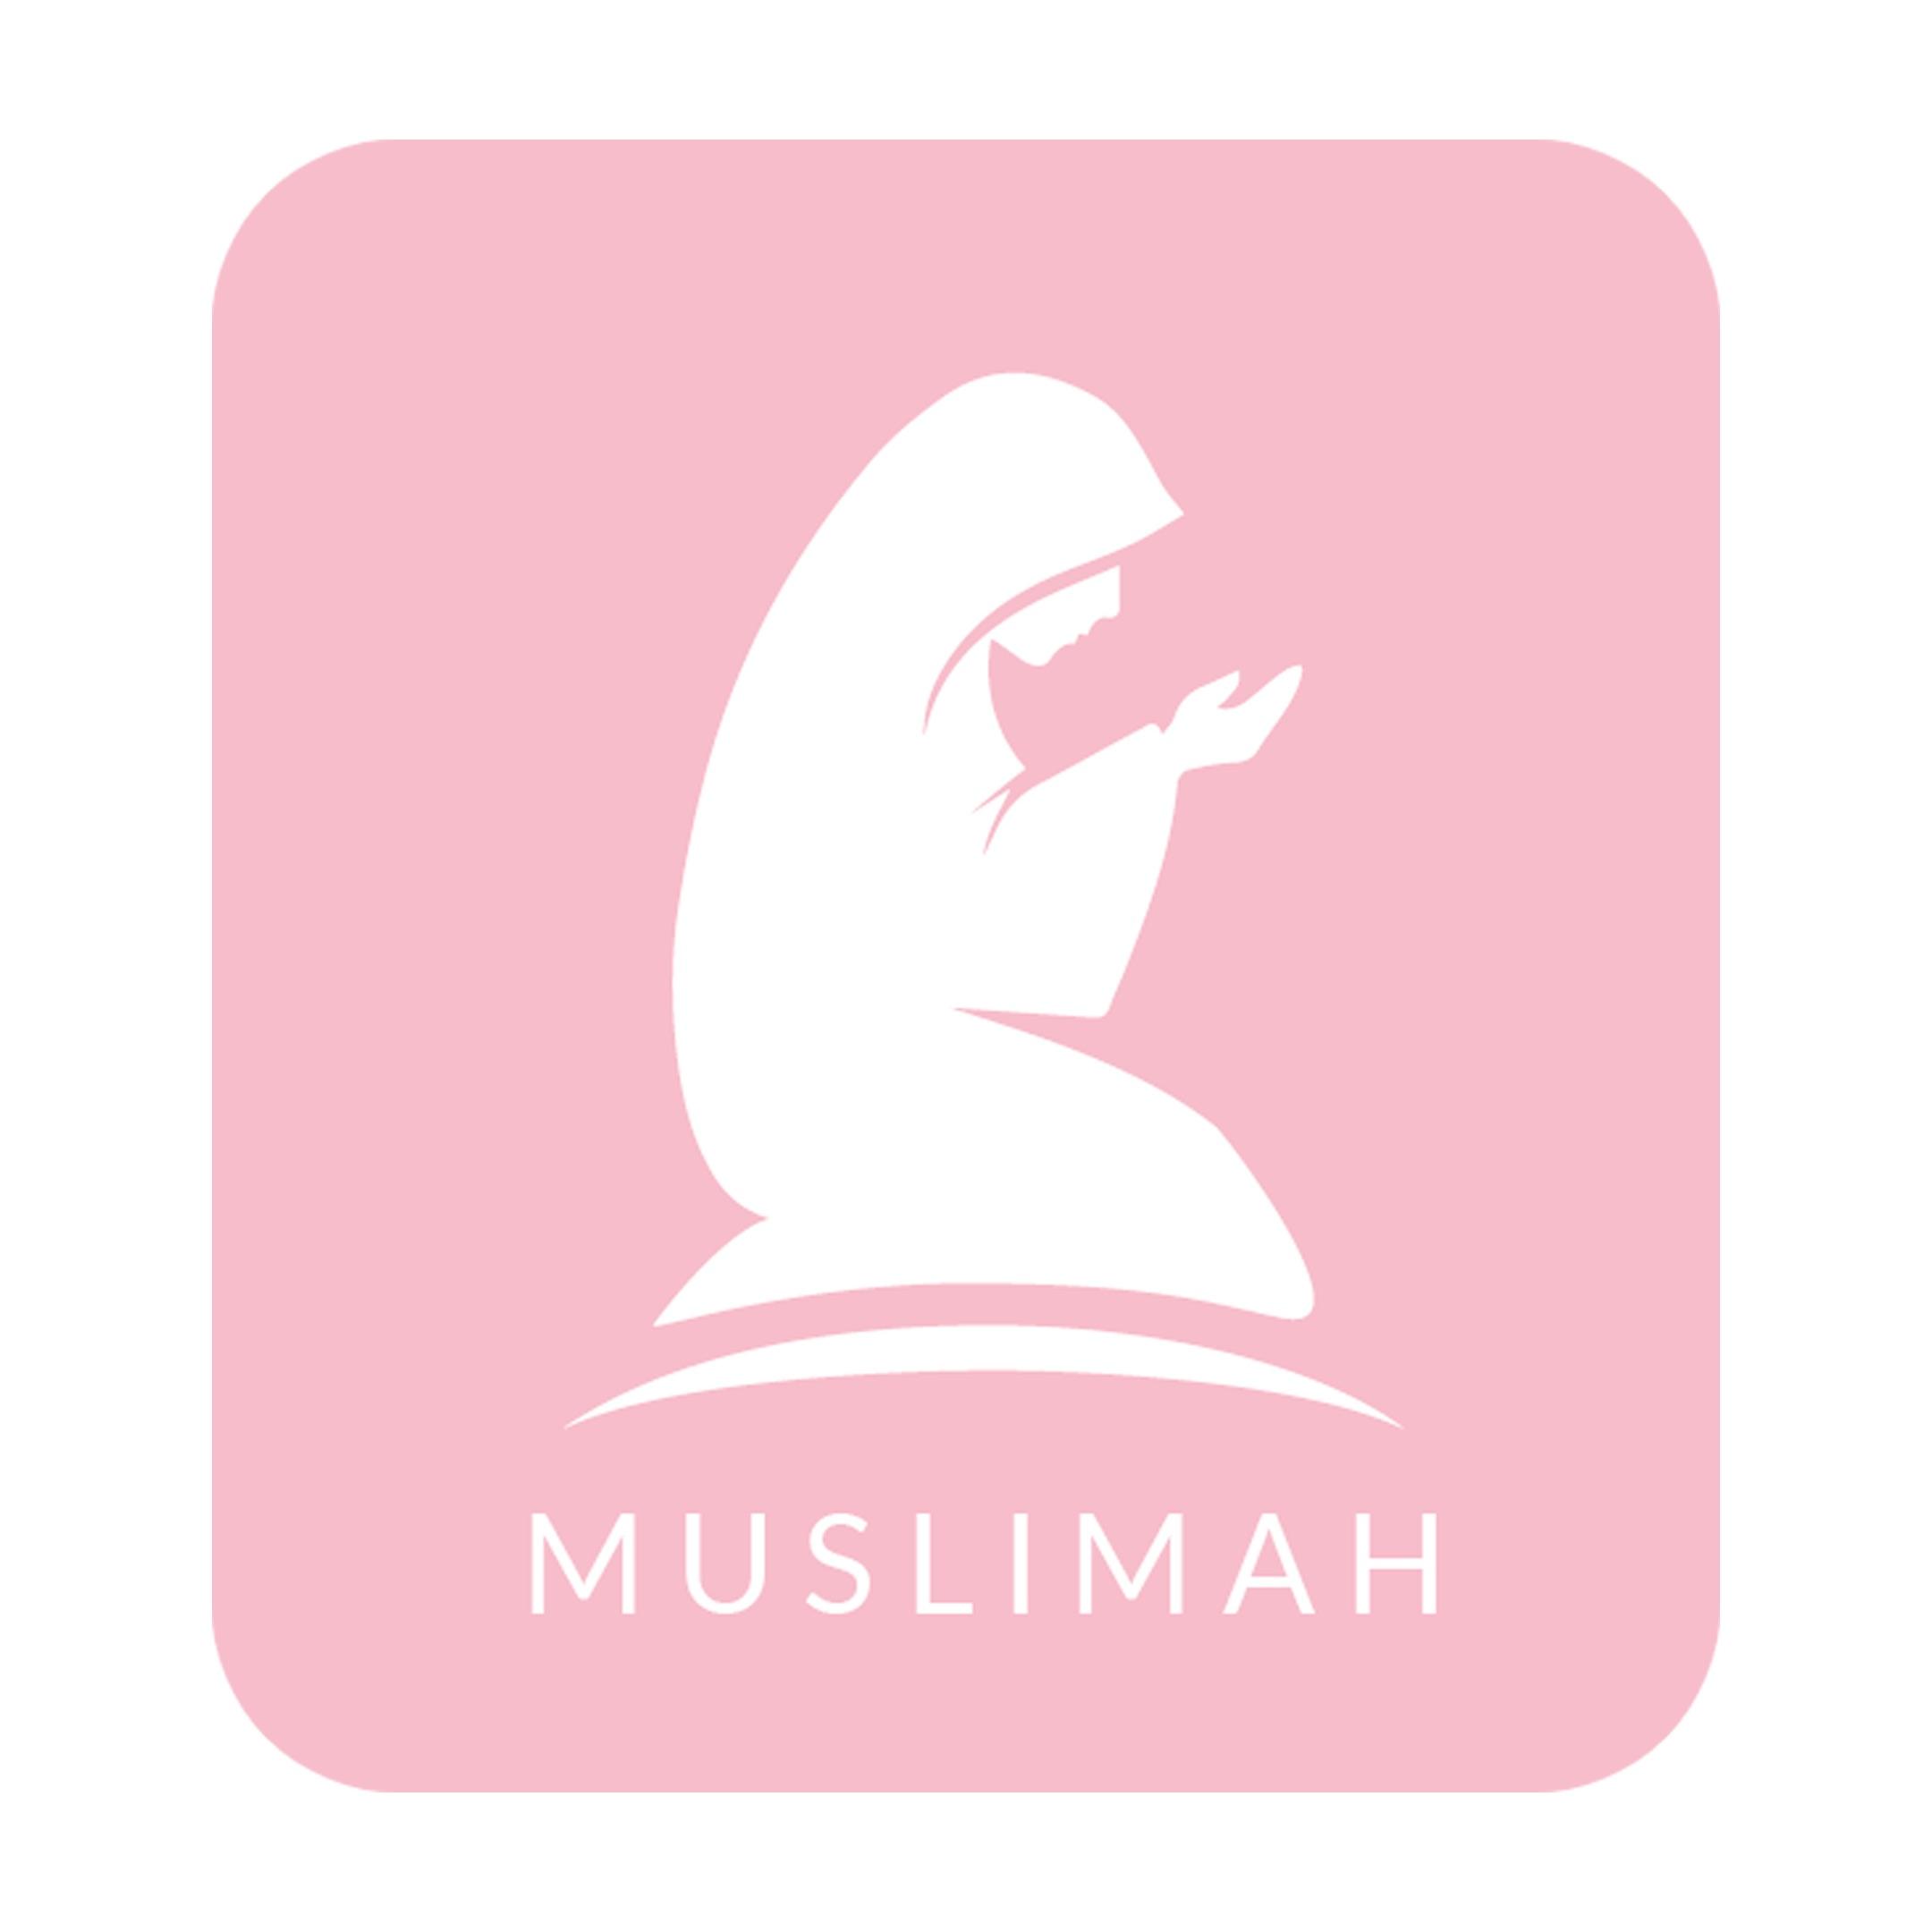 Muslimah logo